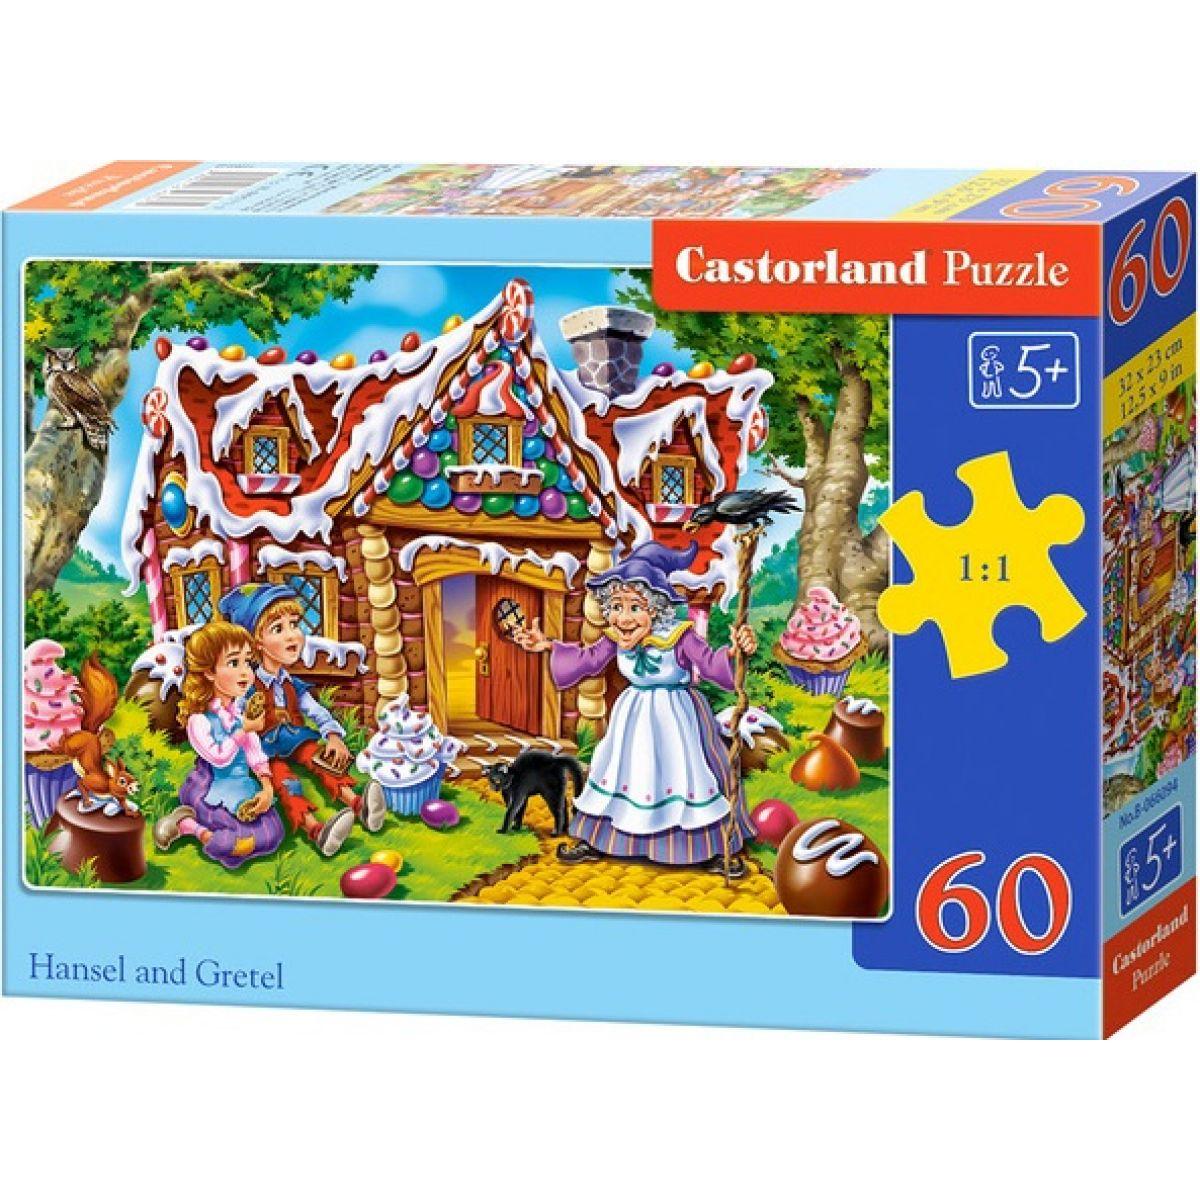 Castorland Puzzle Janko a Marienka 60 dielikov